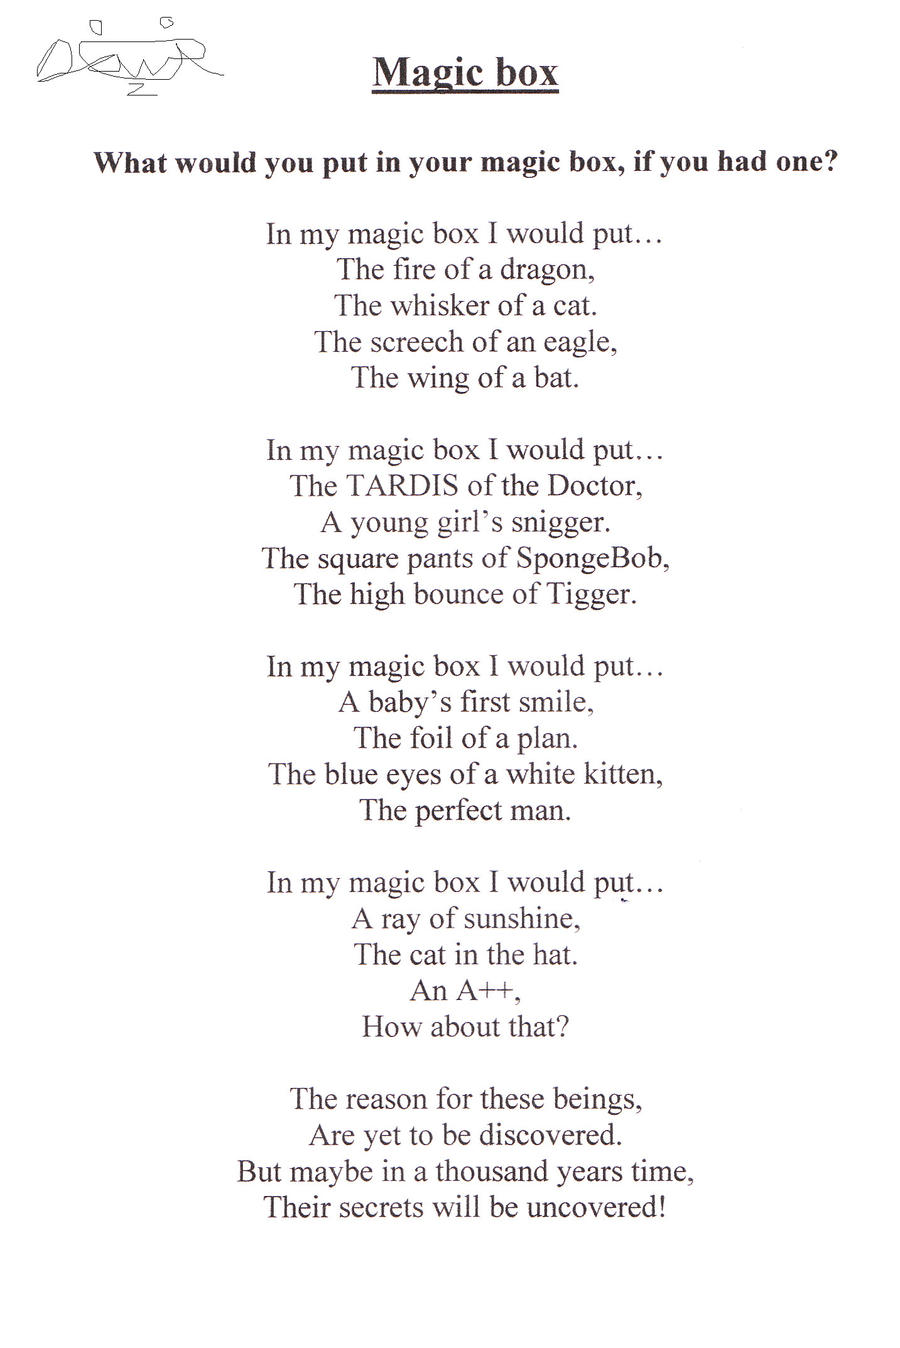 Magic Box Poem by DannyFerb on DeviantArt